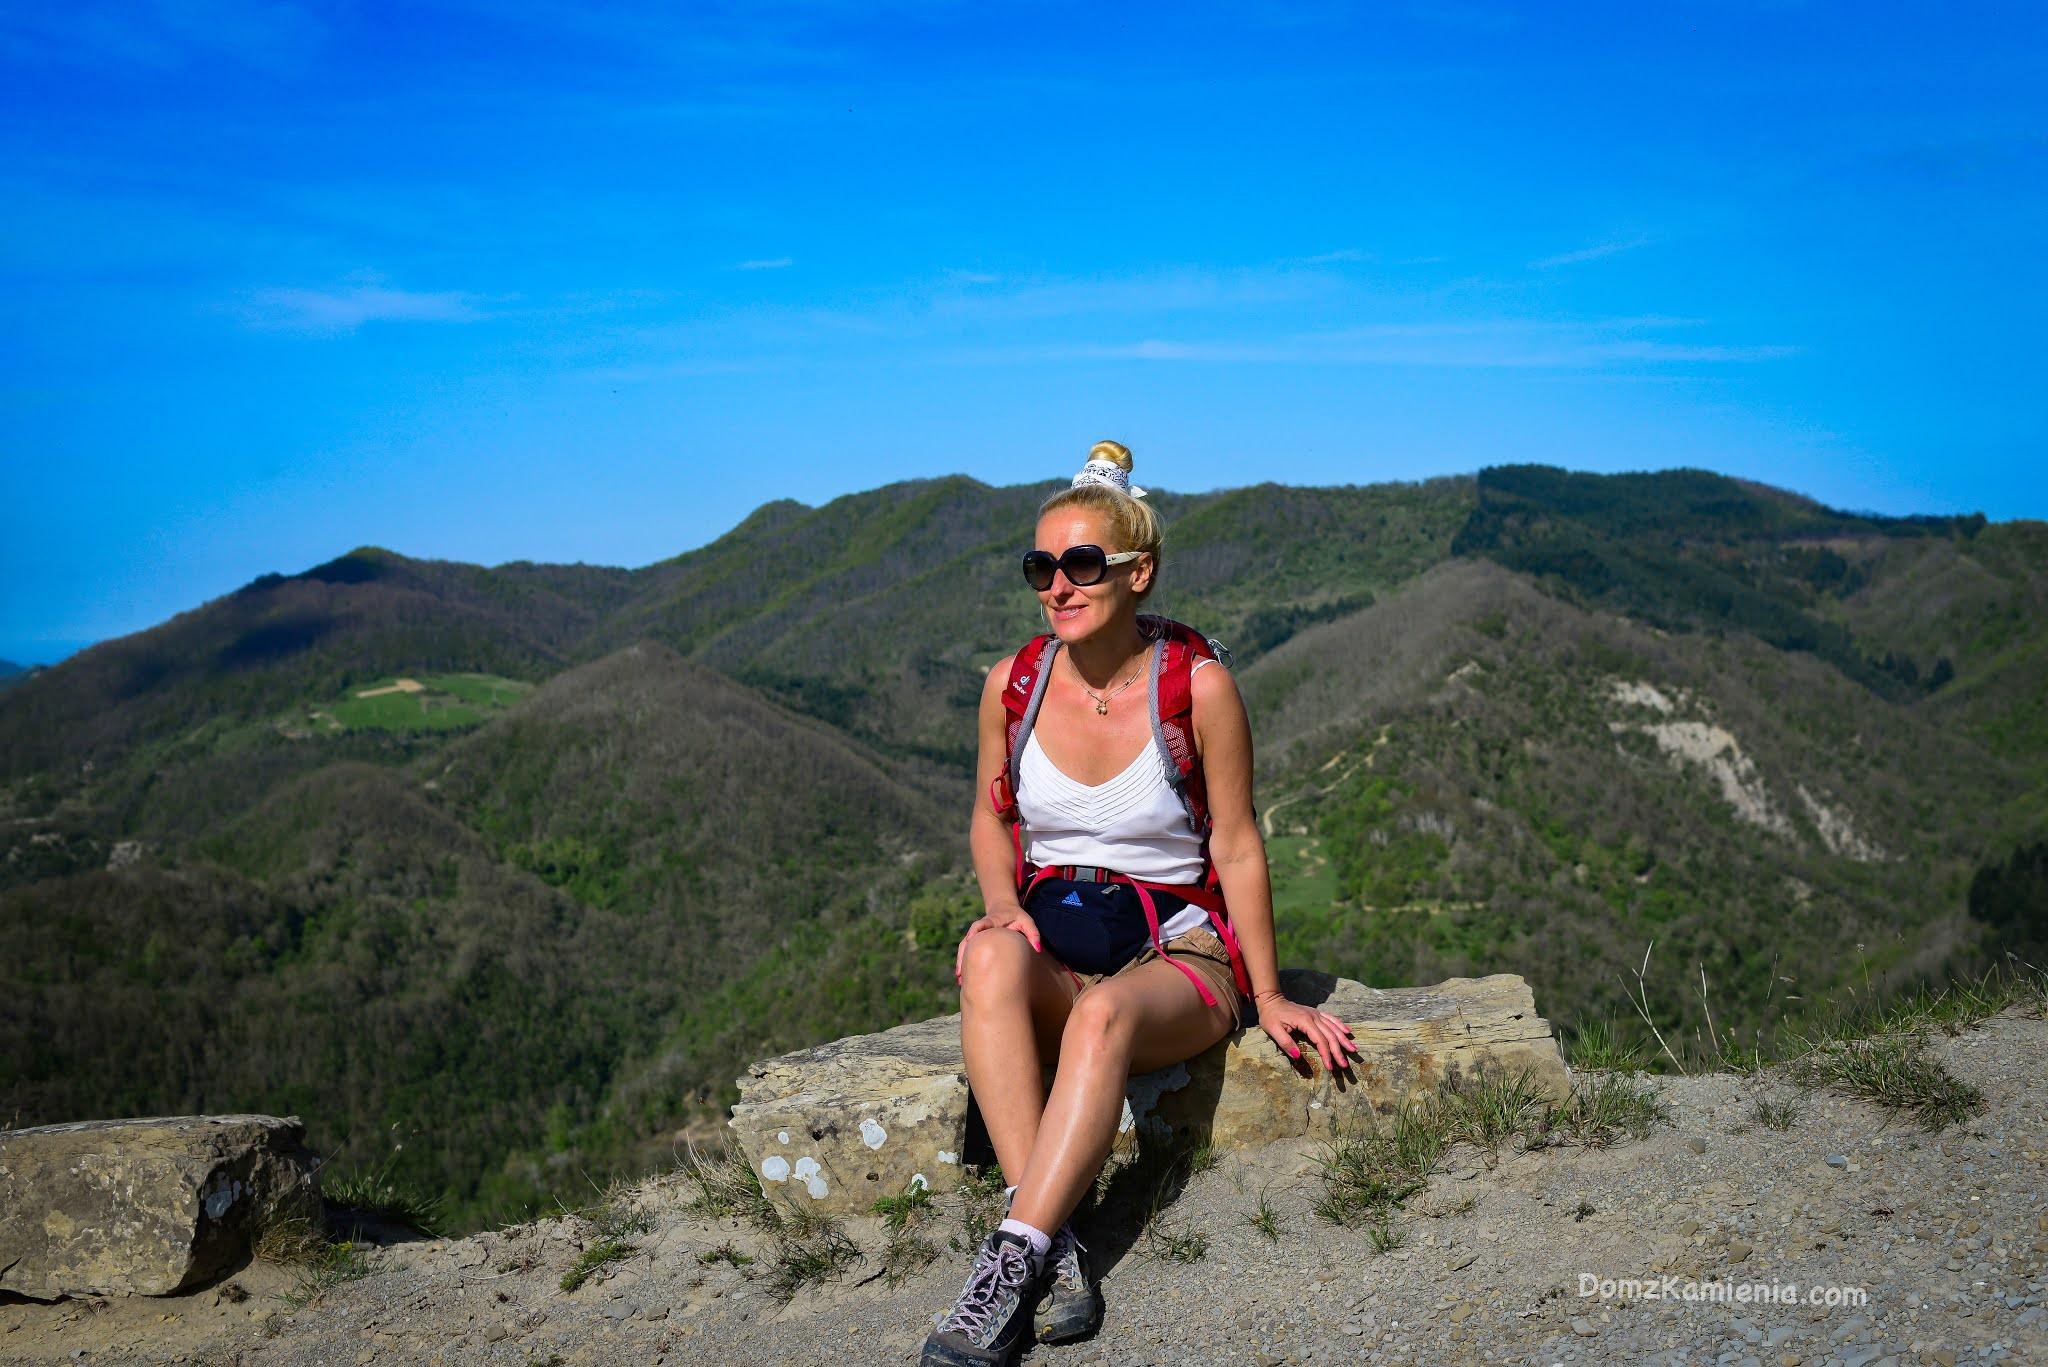 Kasia z Domu z Kamienia, trekking, Monte Lavane